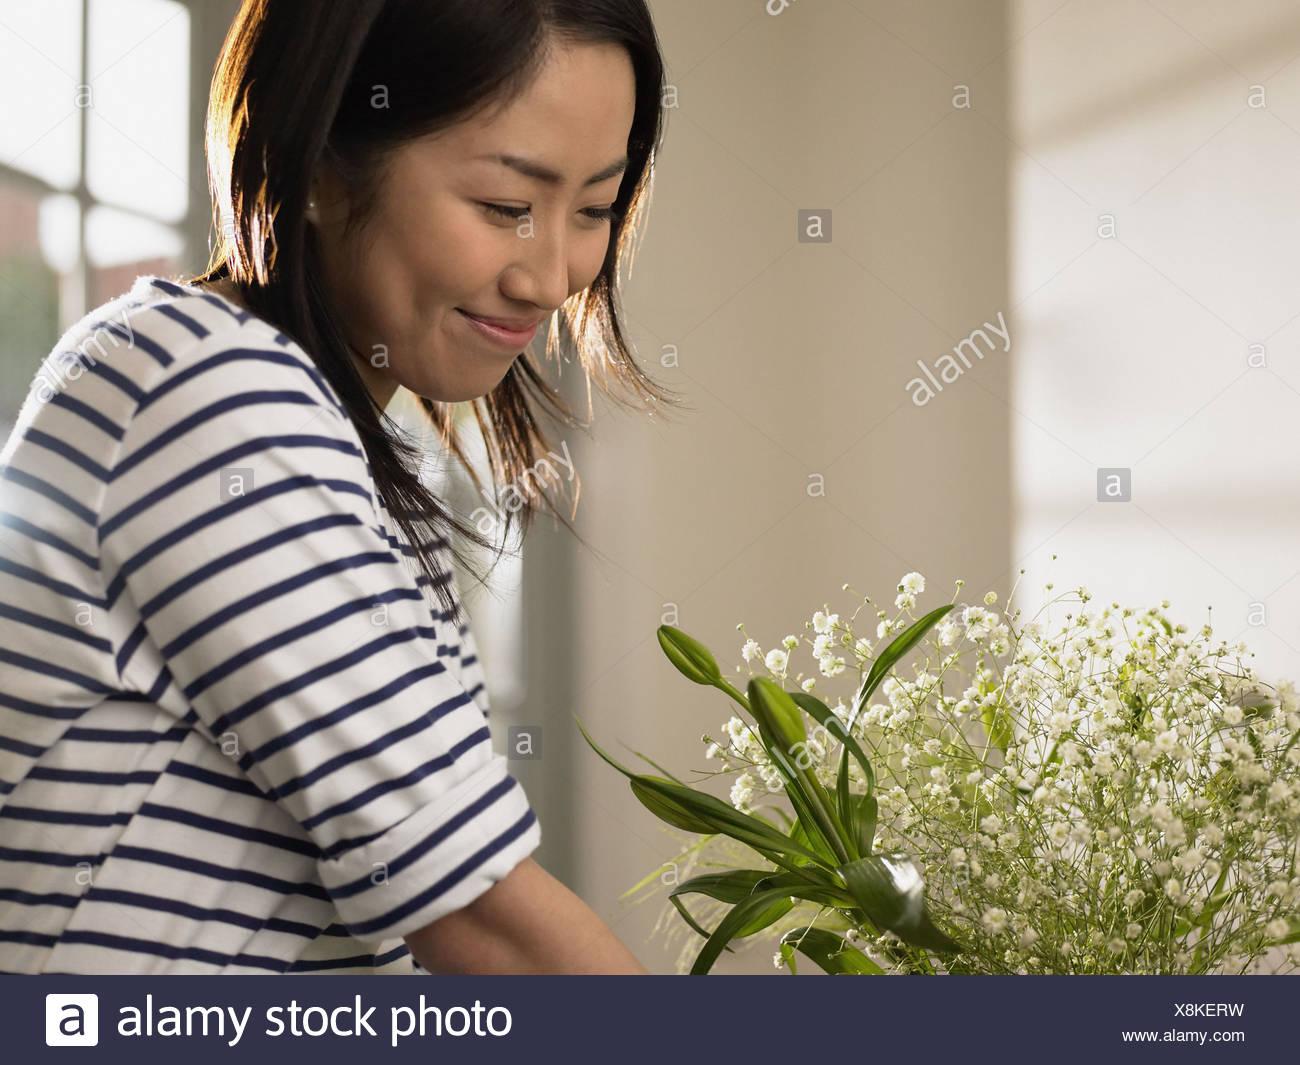 Woman looking at flower arrangement Photo Stock